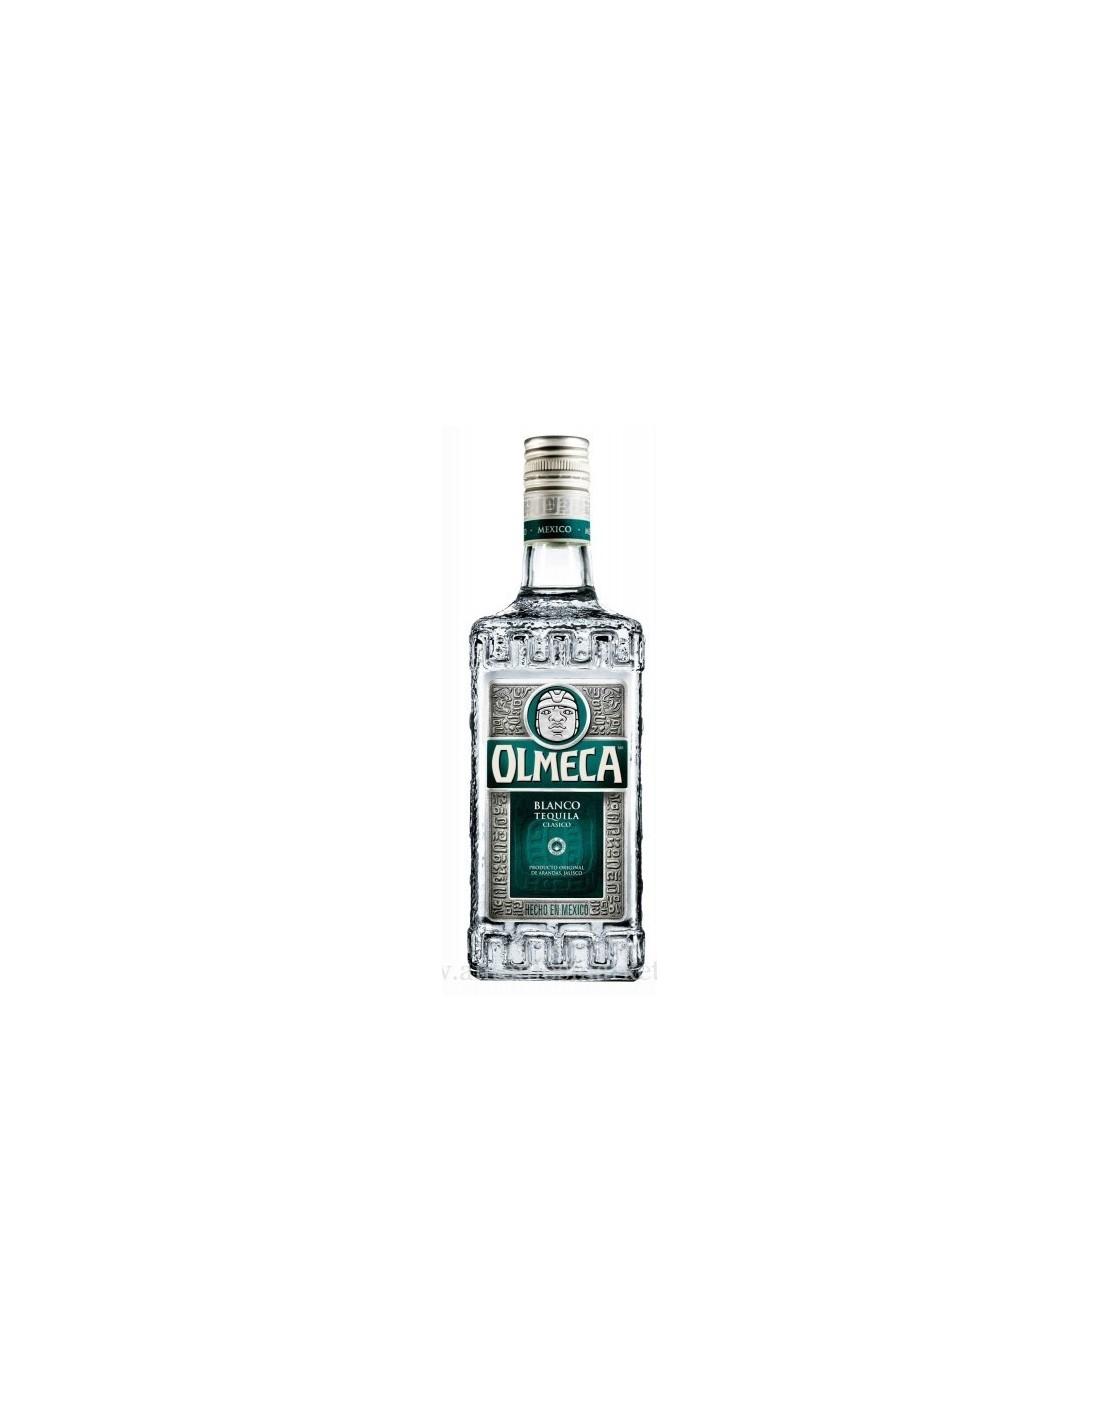 Tequila alba Olmeca Silver Blanco 0.7L, 38% alc., Mexic